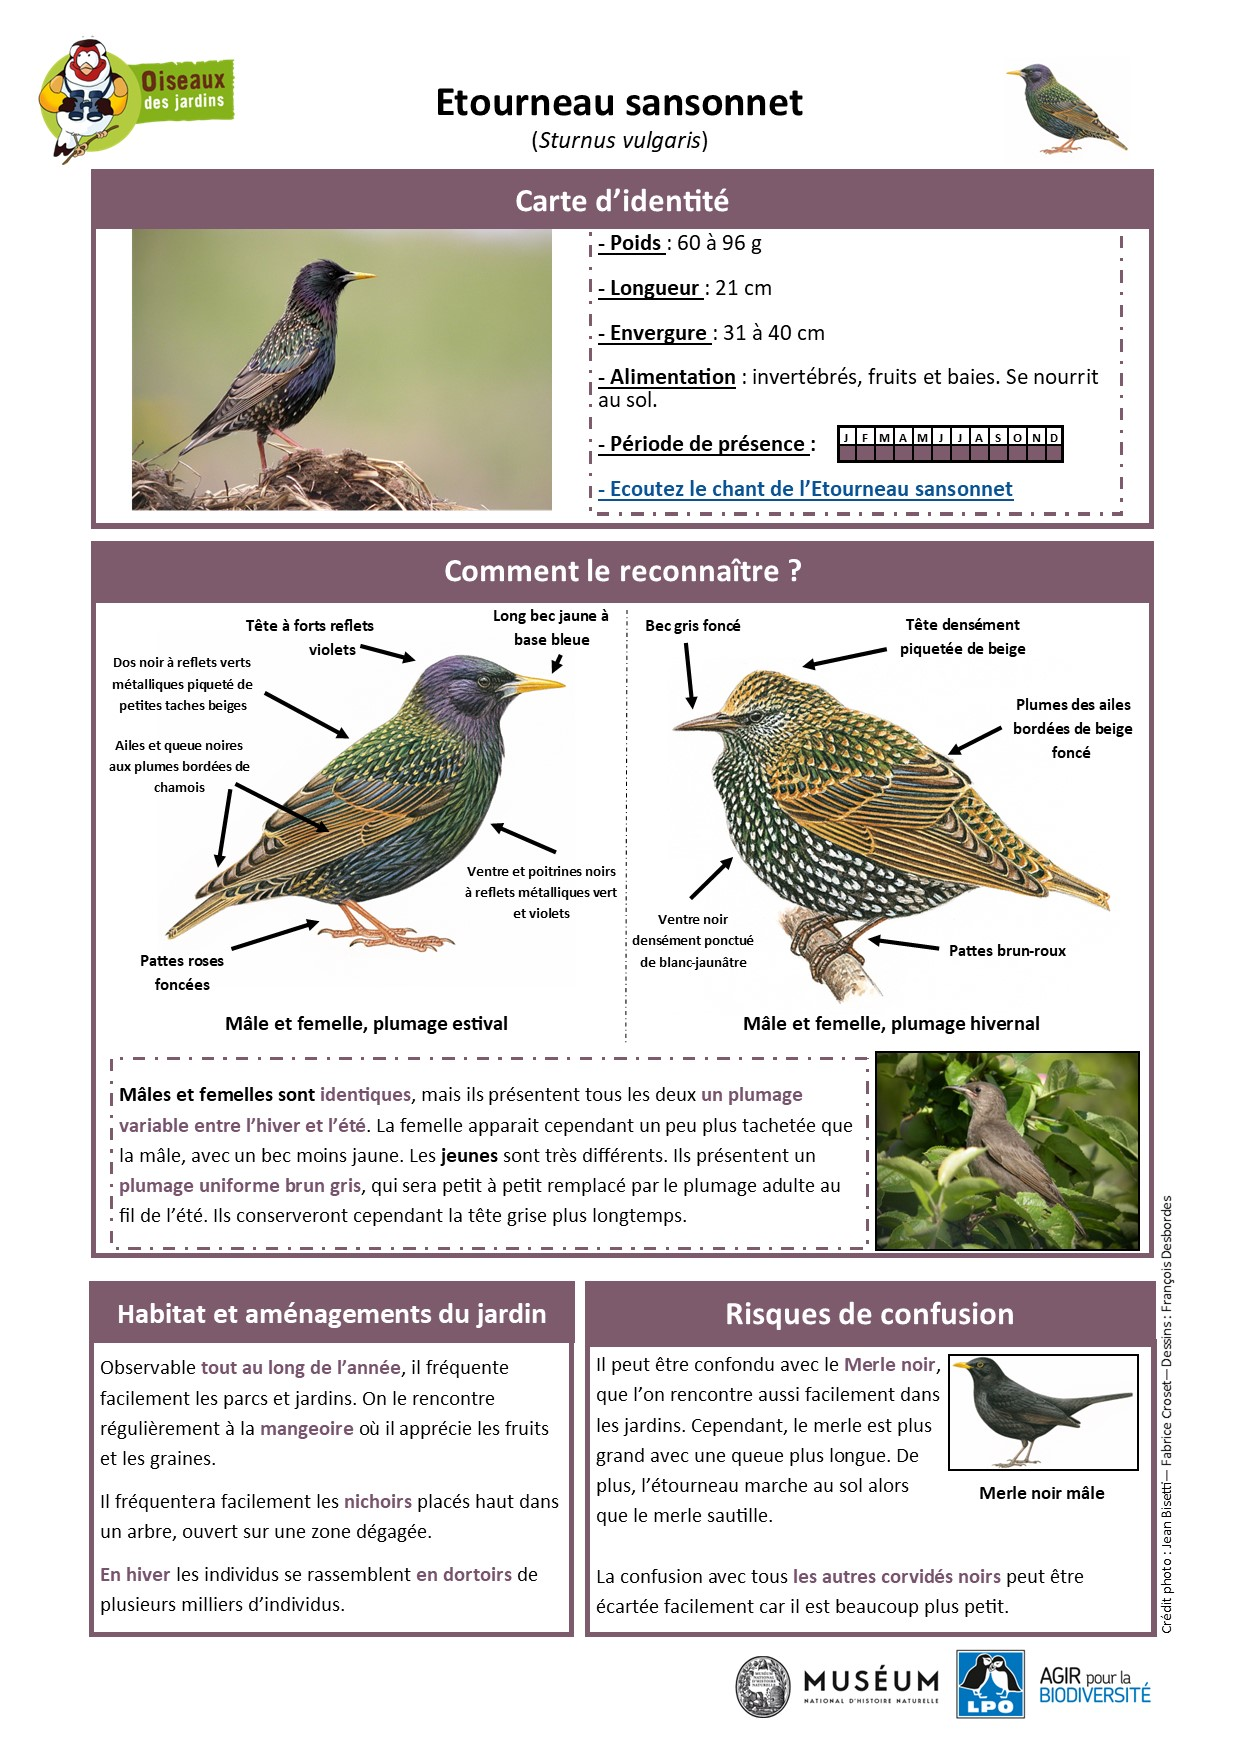 https://cdnfiles1.biolovision.net/www.oiseauxdesjardins.fr/userfiles/Fichesespces/FicheespceETScorrige.jpg